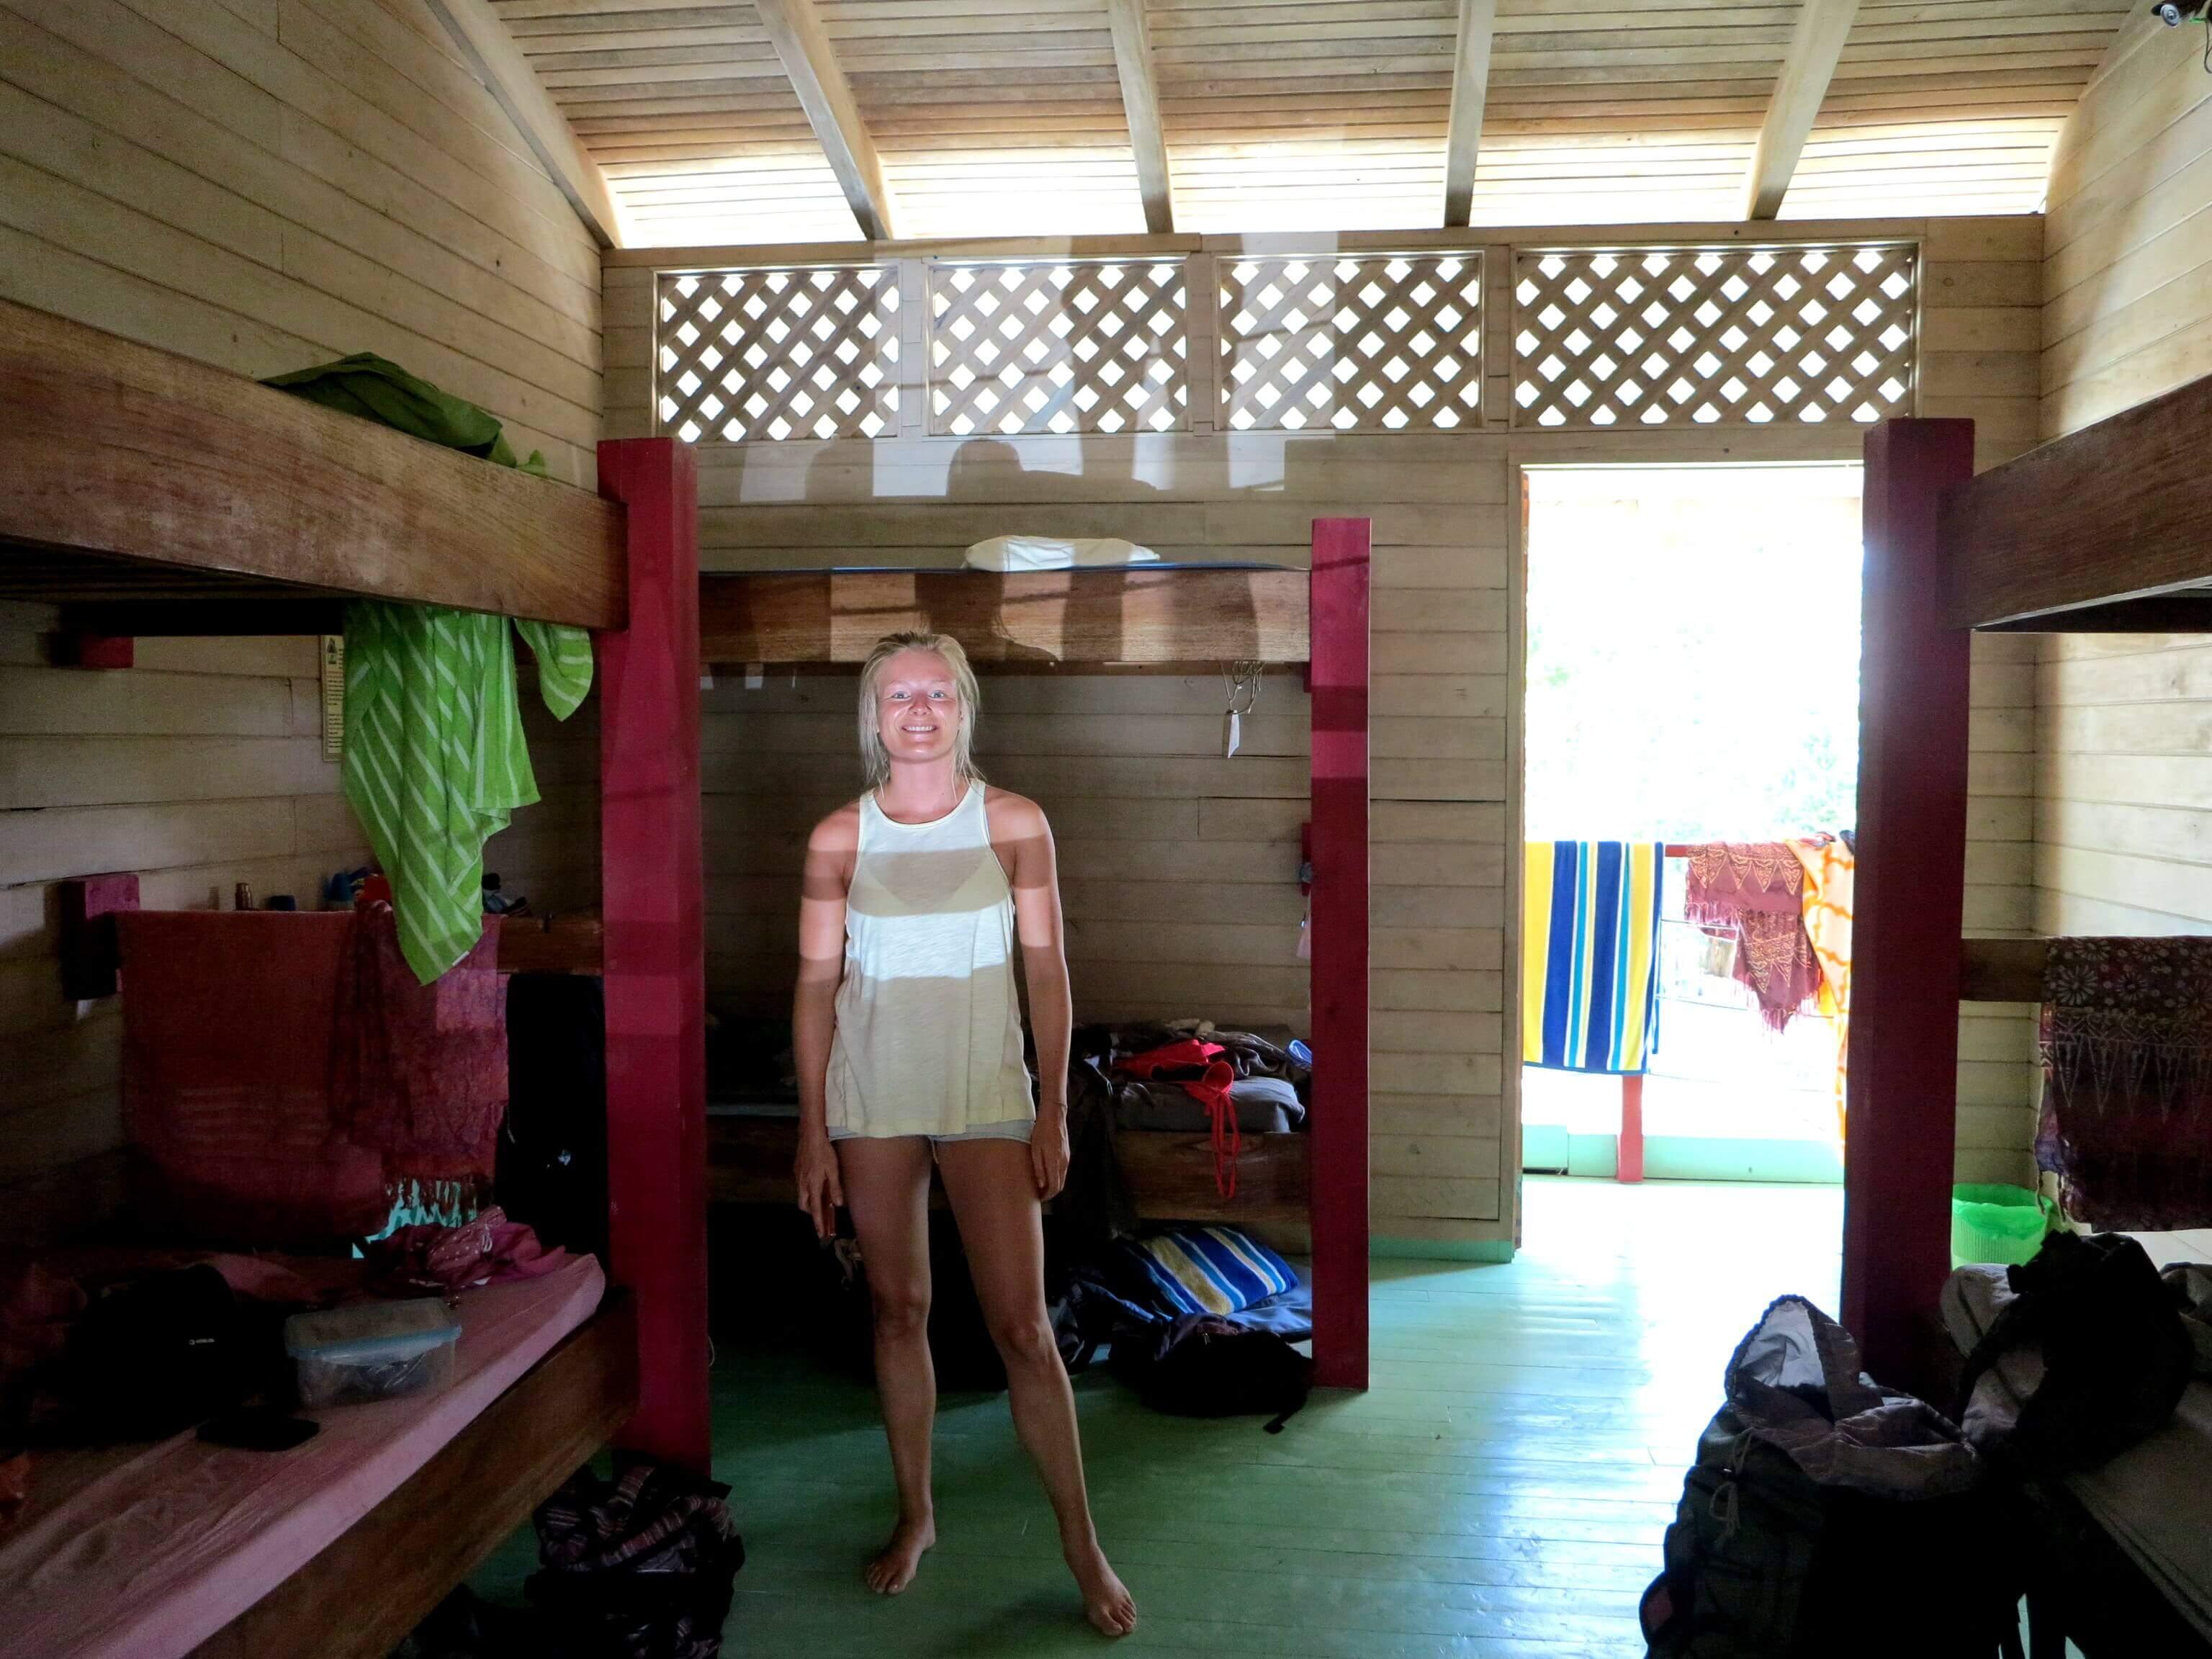 Mehrbettzimmel im Hostel Wavetrotters in Santa Teresa